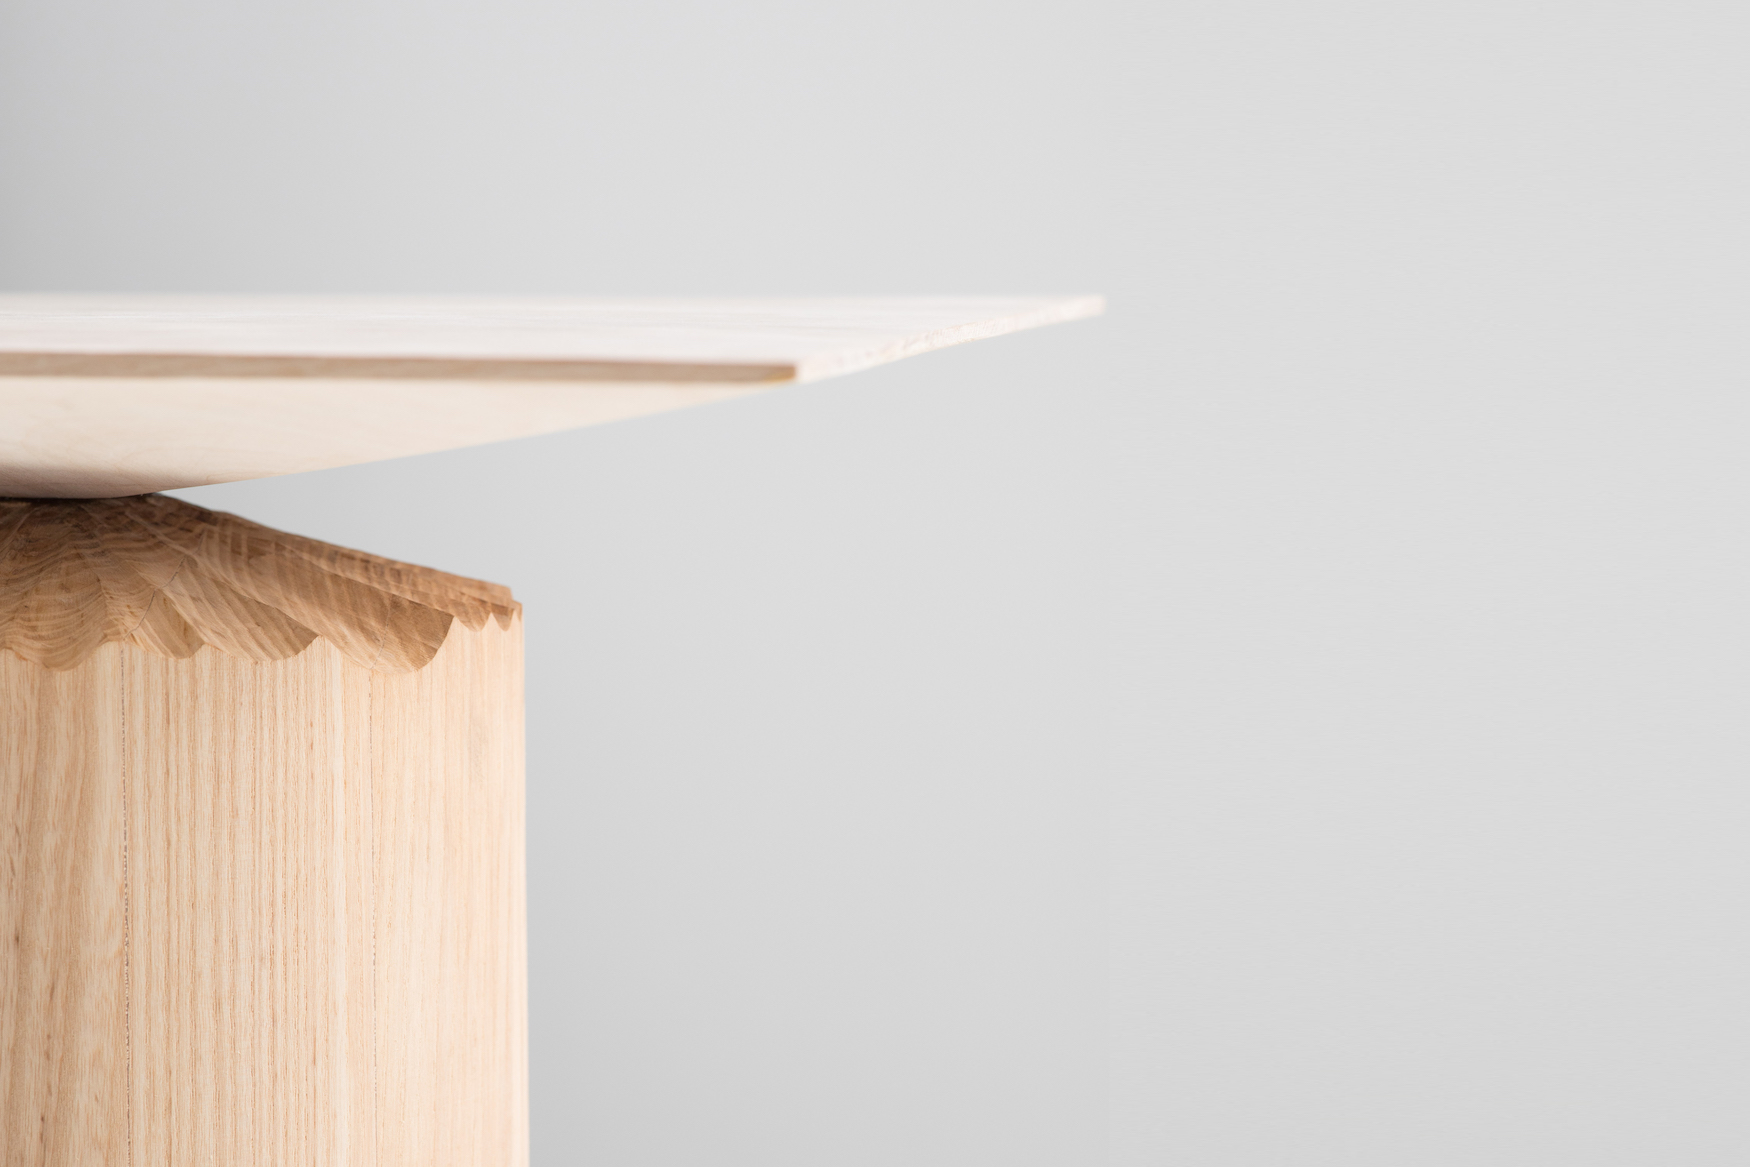 Element Side Table by Sanna Völker